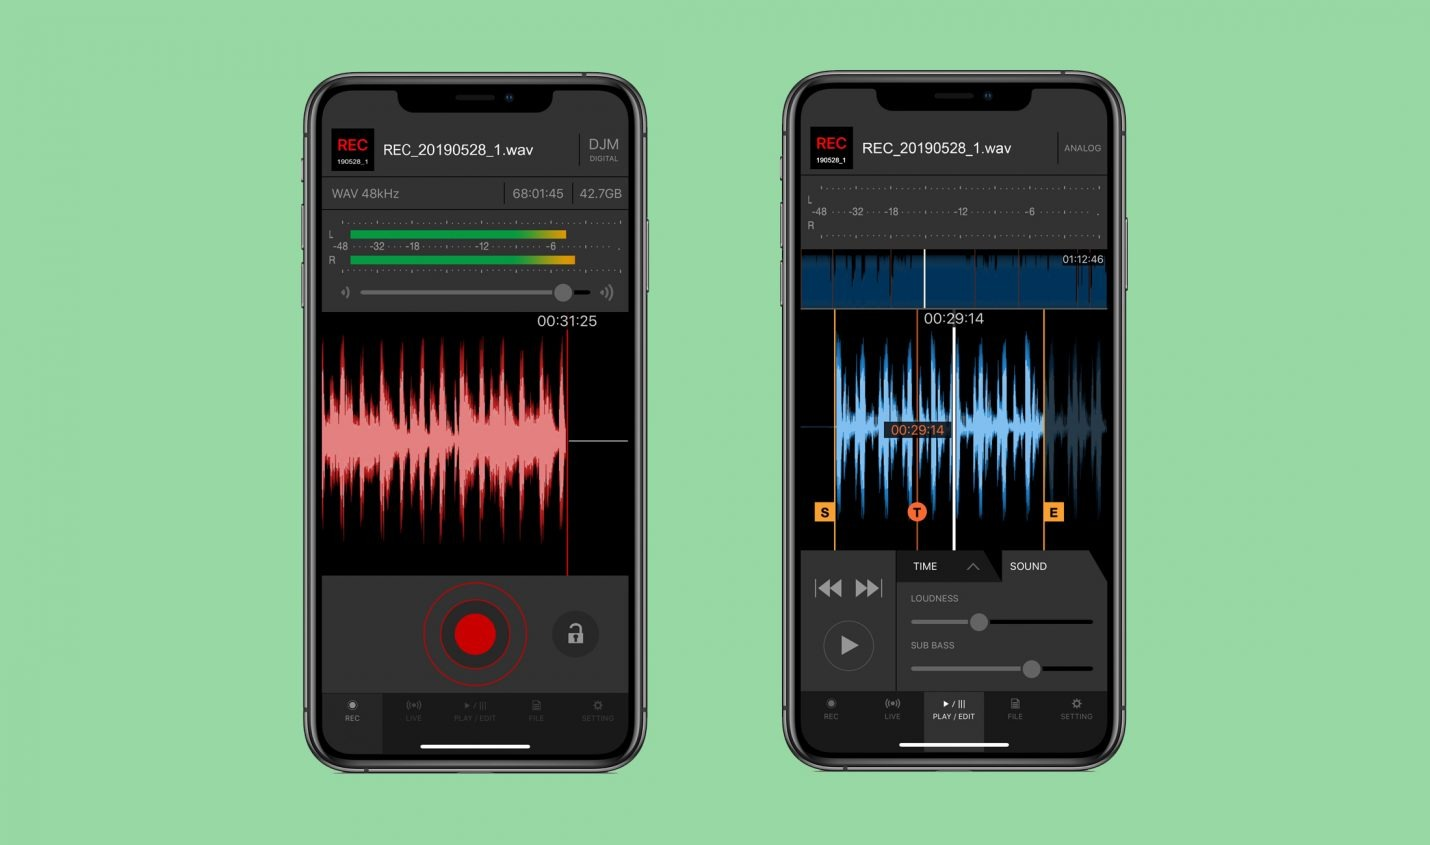 DJM-REC: Pioneer DJ kümmert sich mit Dubset um Musikrechte in Mixes